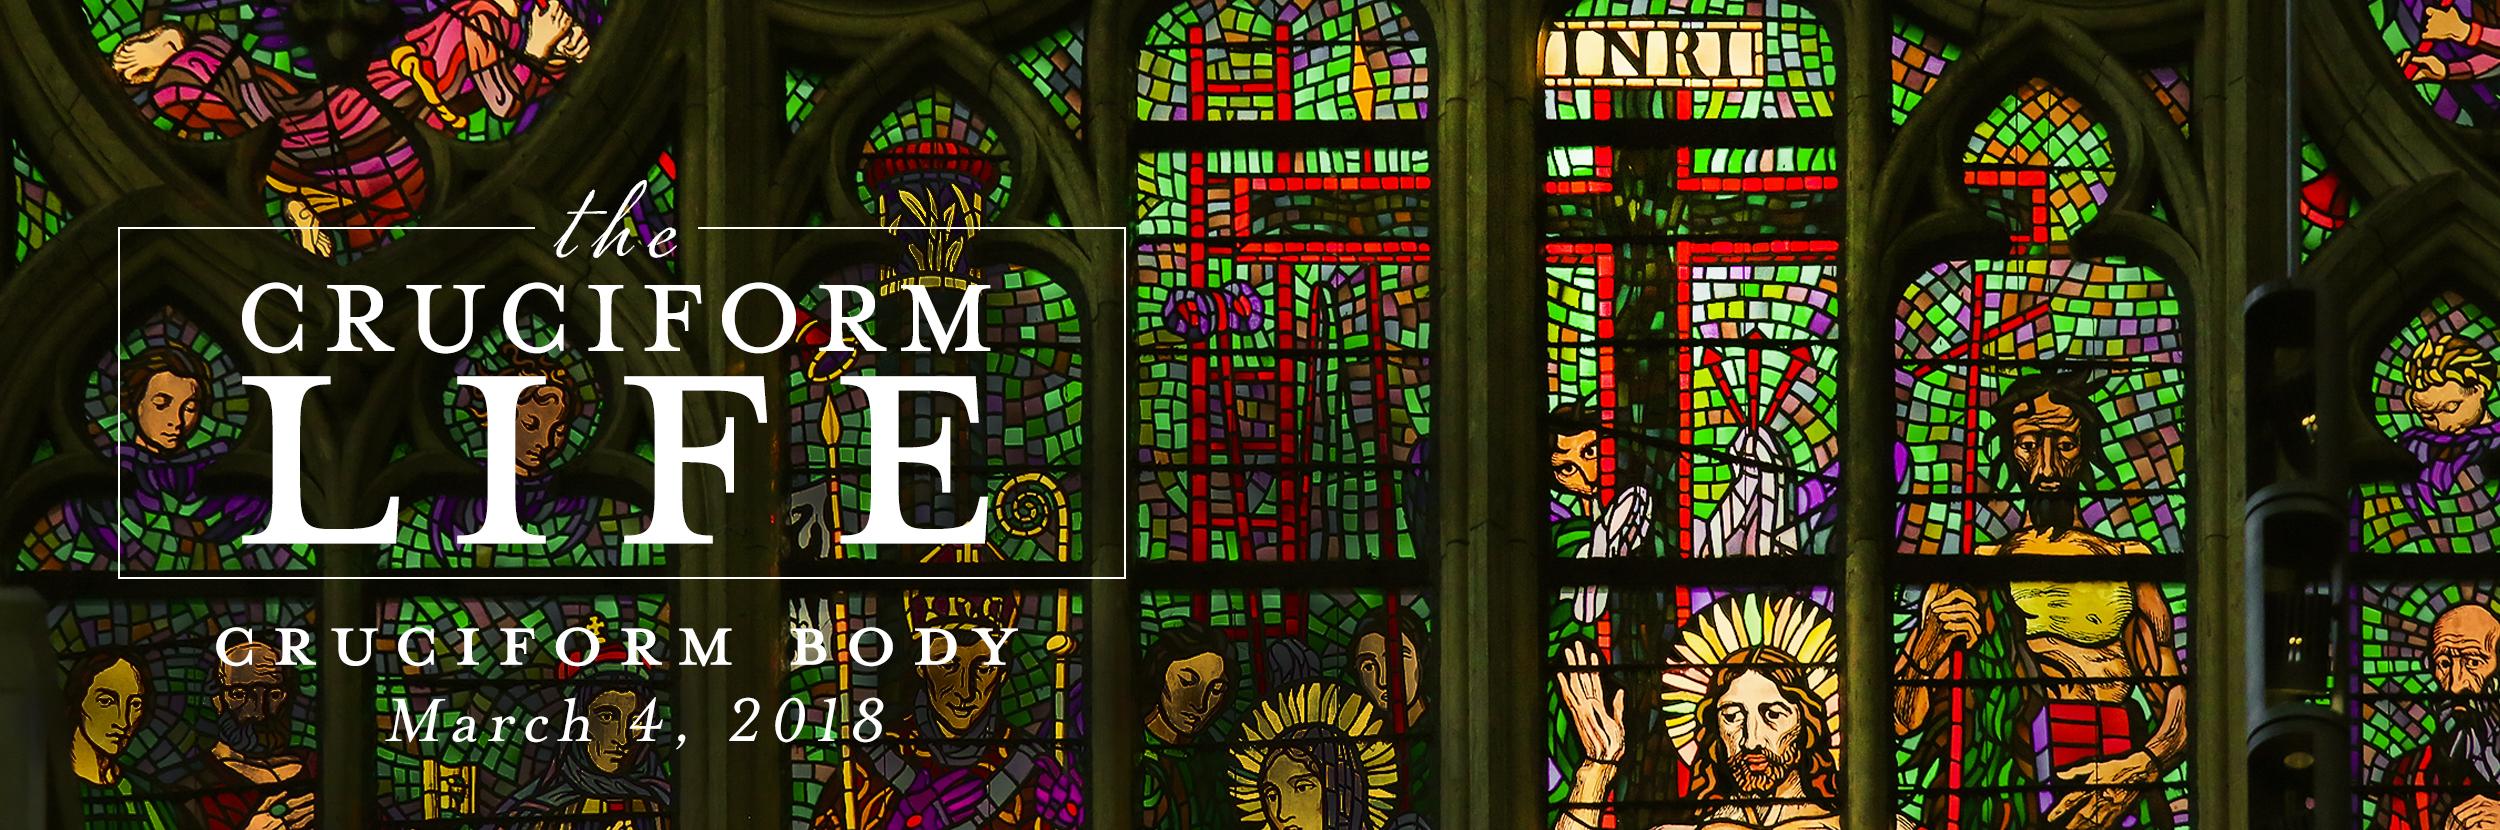 5. Cruciform Life_BODY Banner.jpg